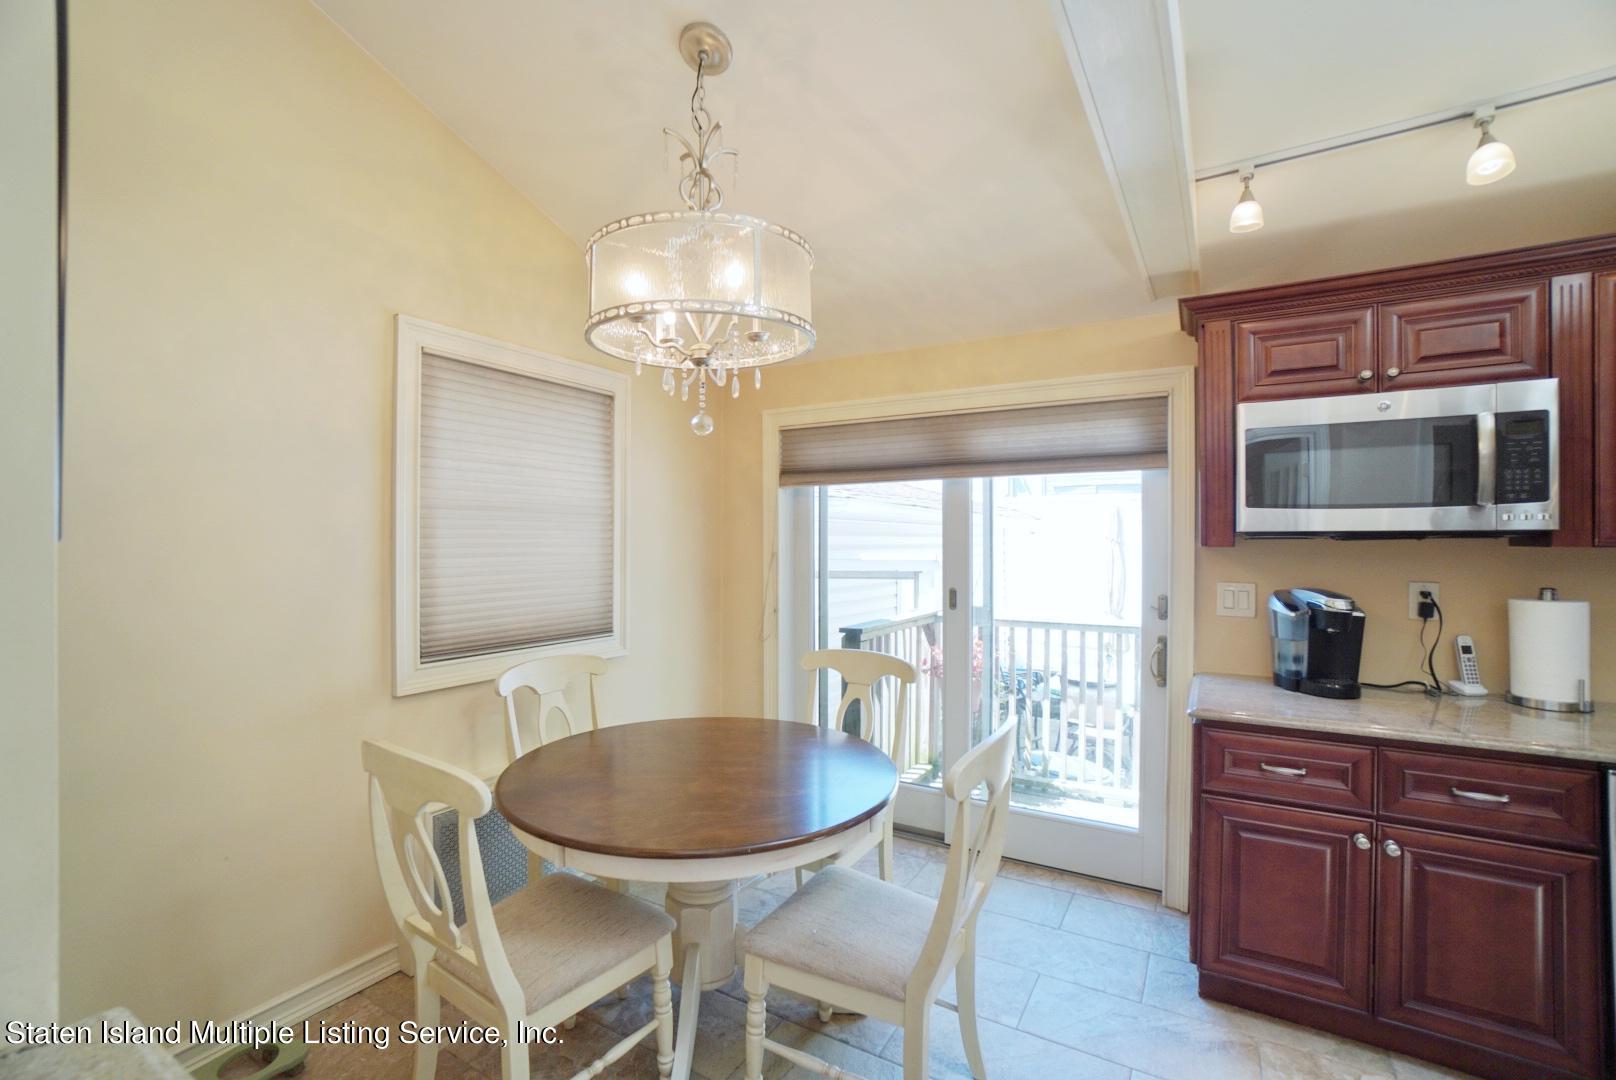 Single Family - Detached 264 Fisher Avenue  Staten Island, NY 10307, MLS-1146898-22